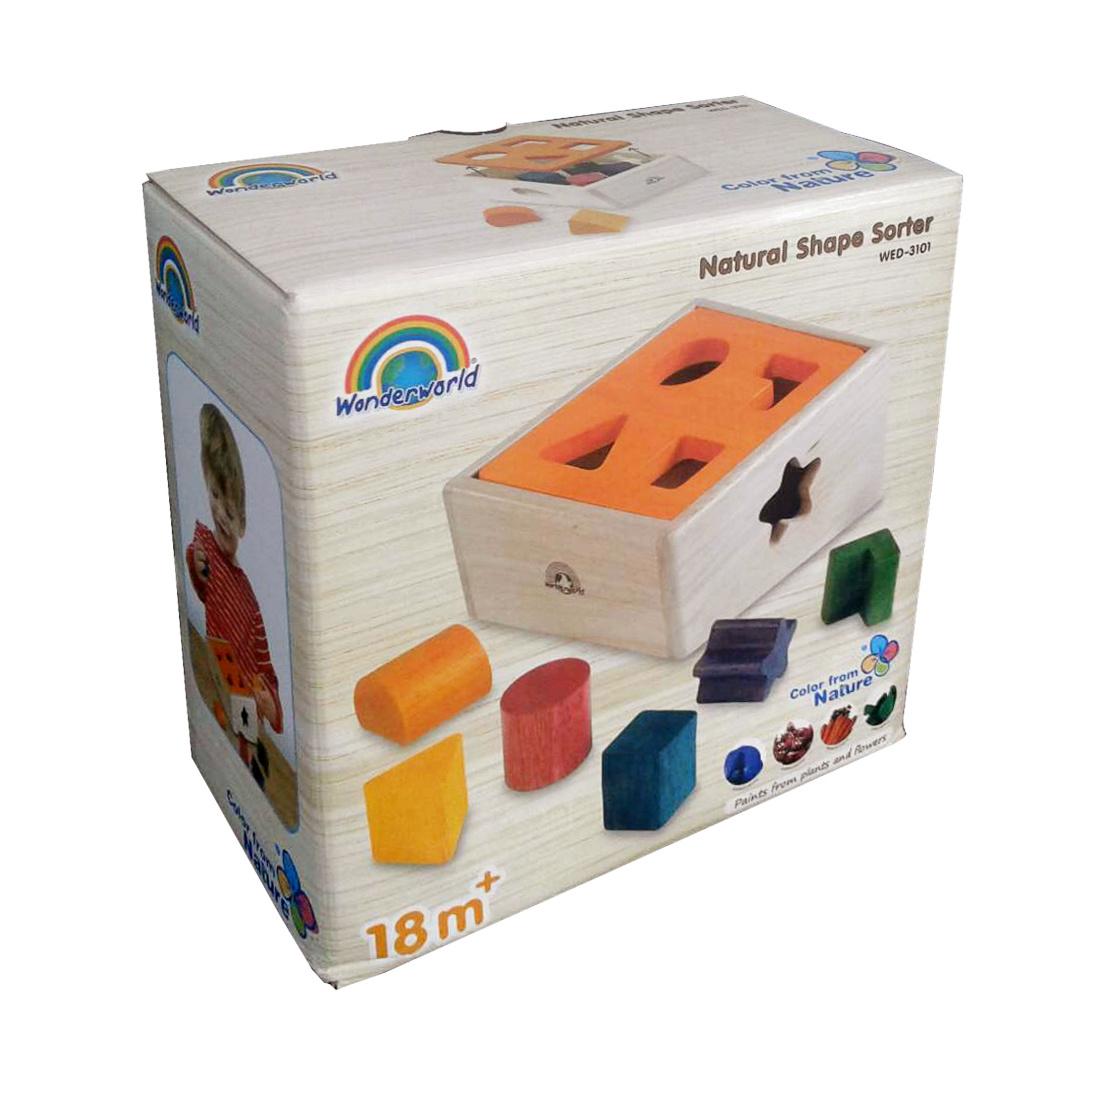 Сортер Wonderworld Products Co., Ltd. WED-3101 #1